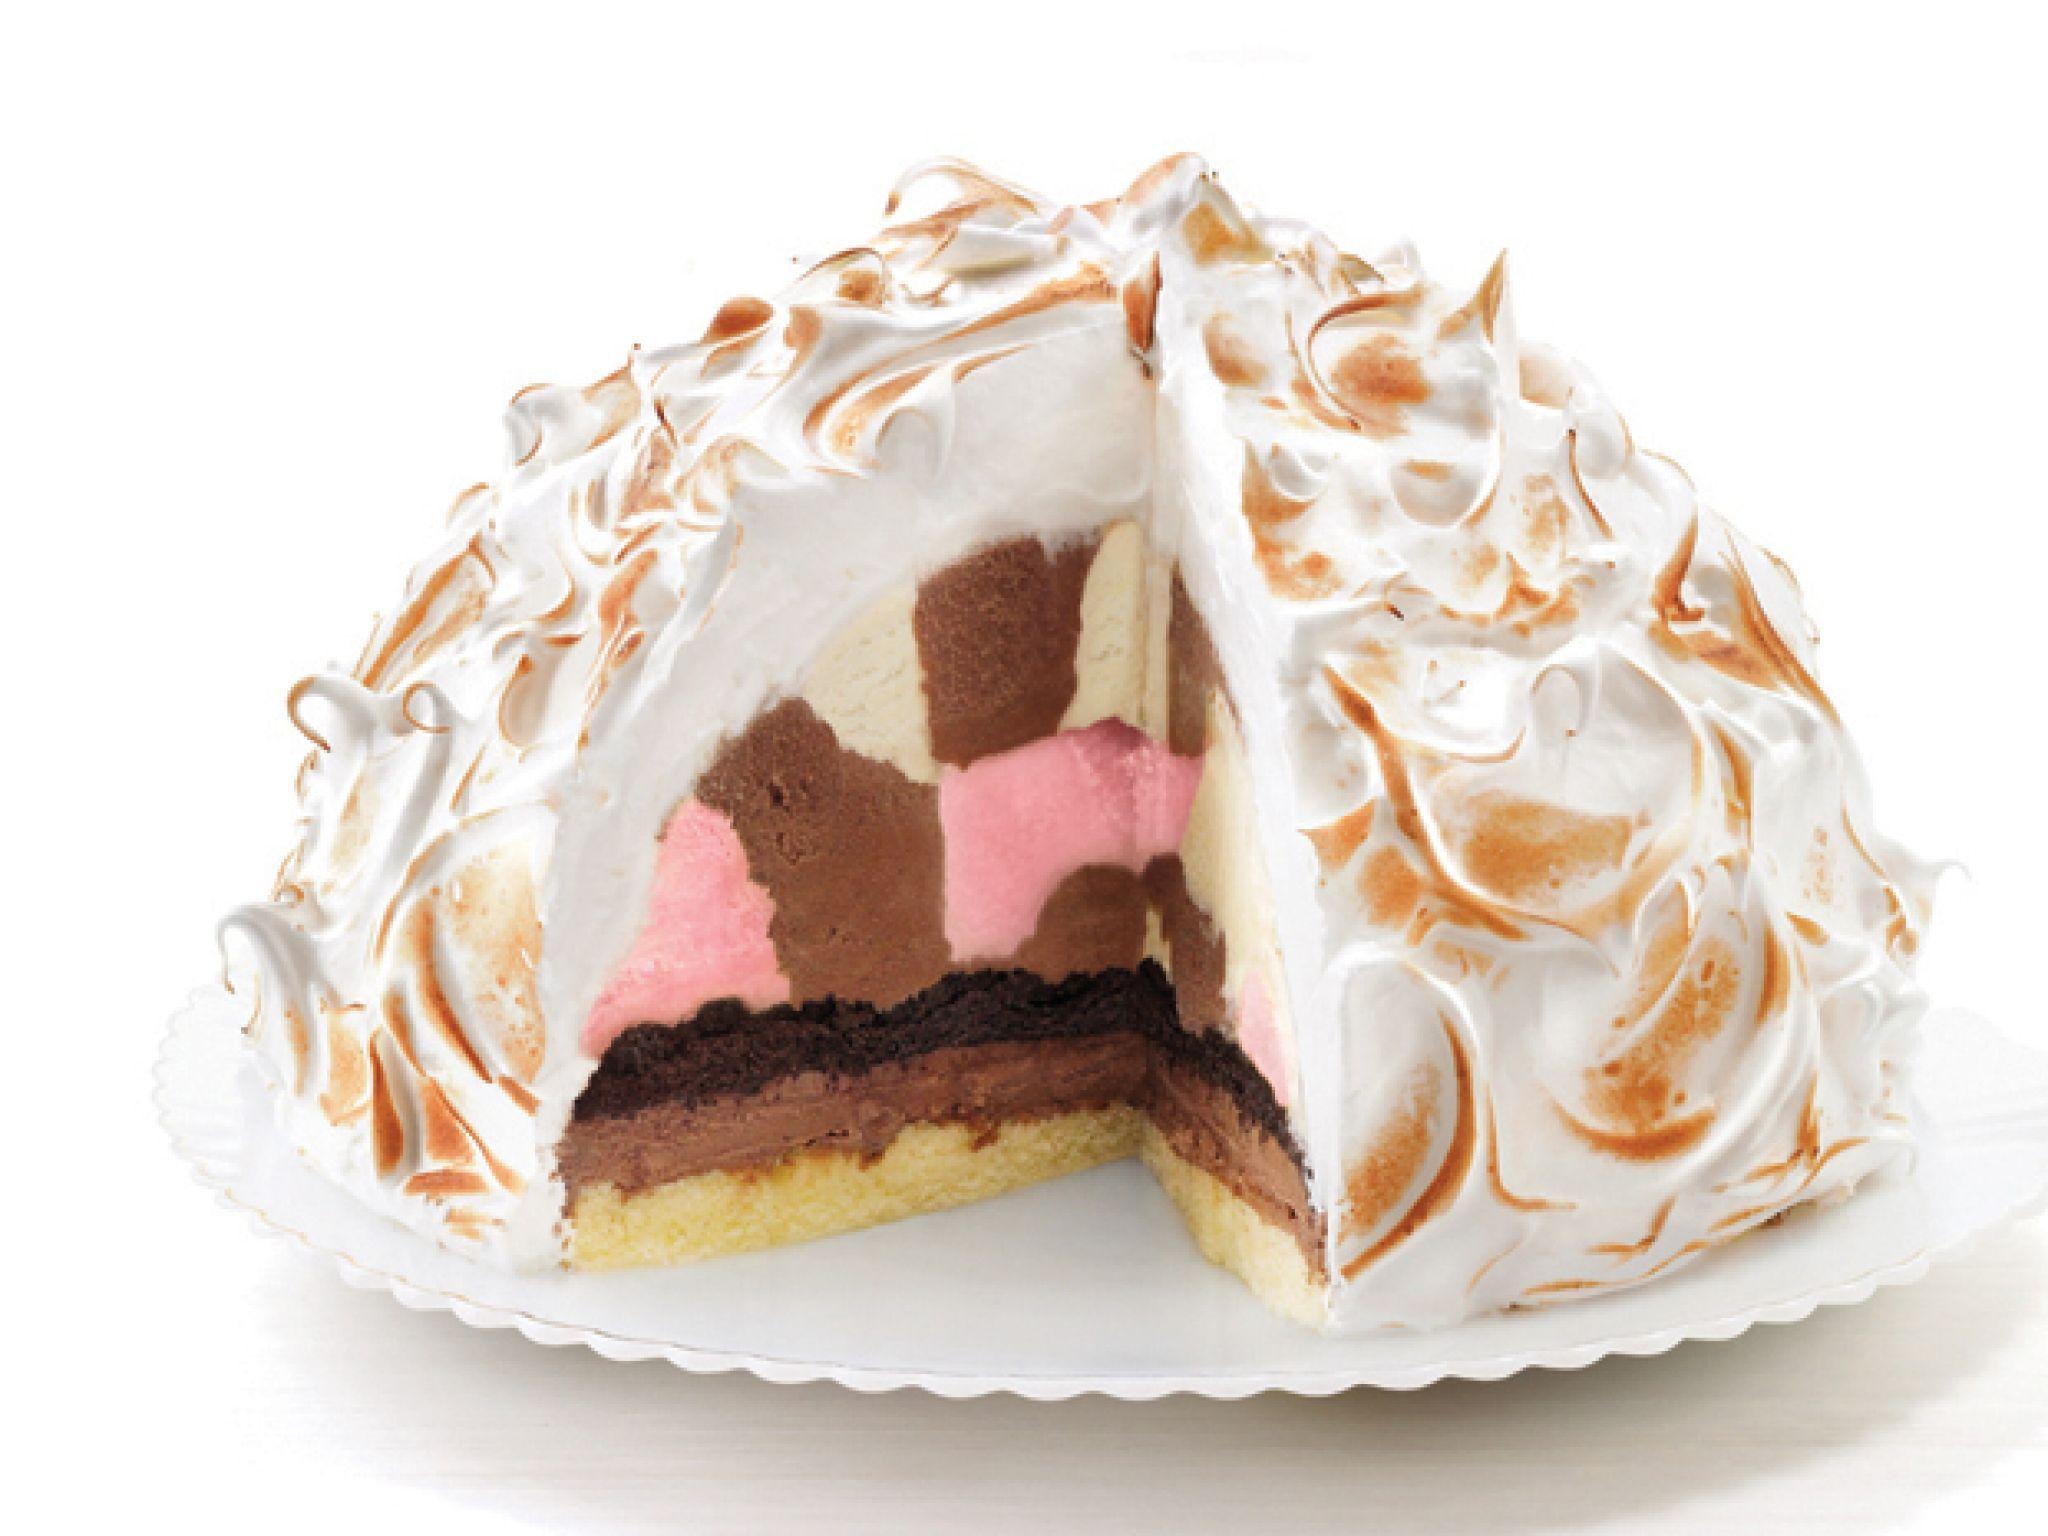 Kroger Ice Cream Cake Recipe